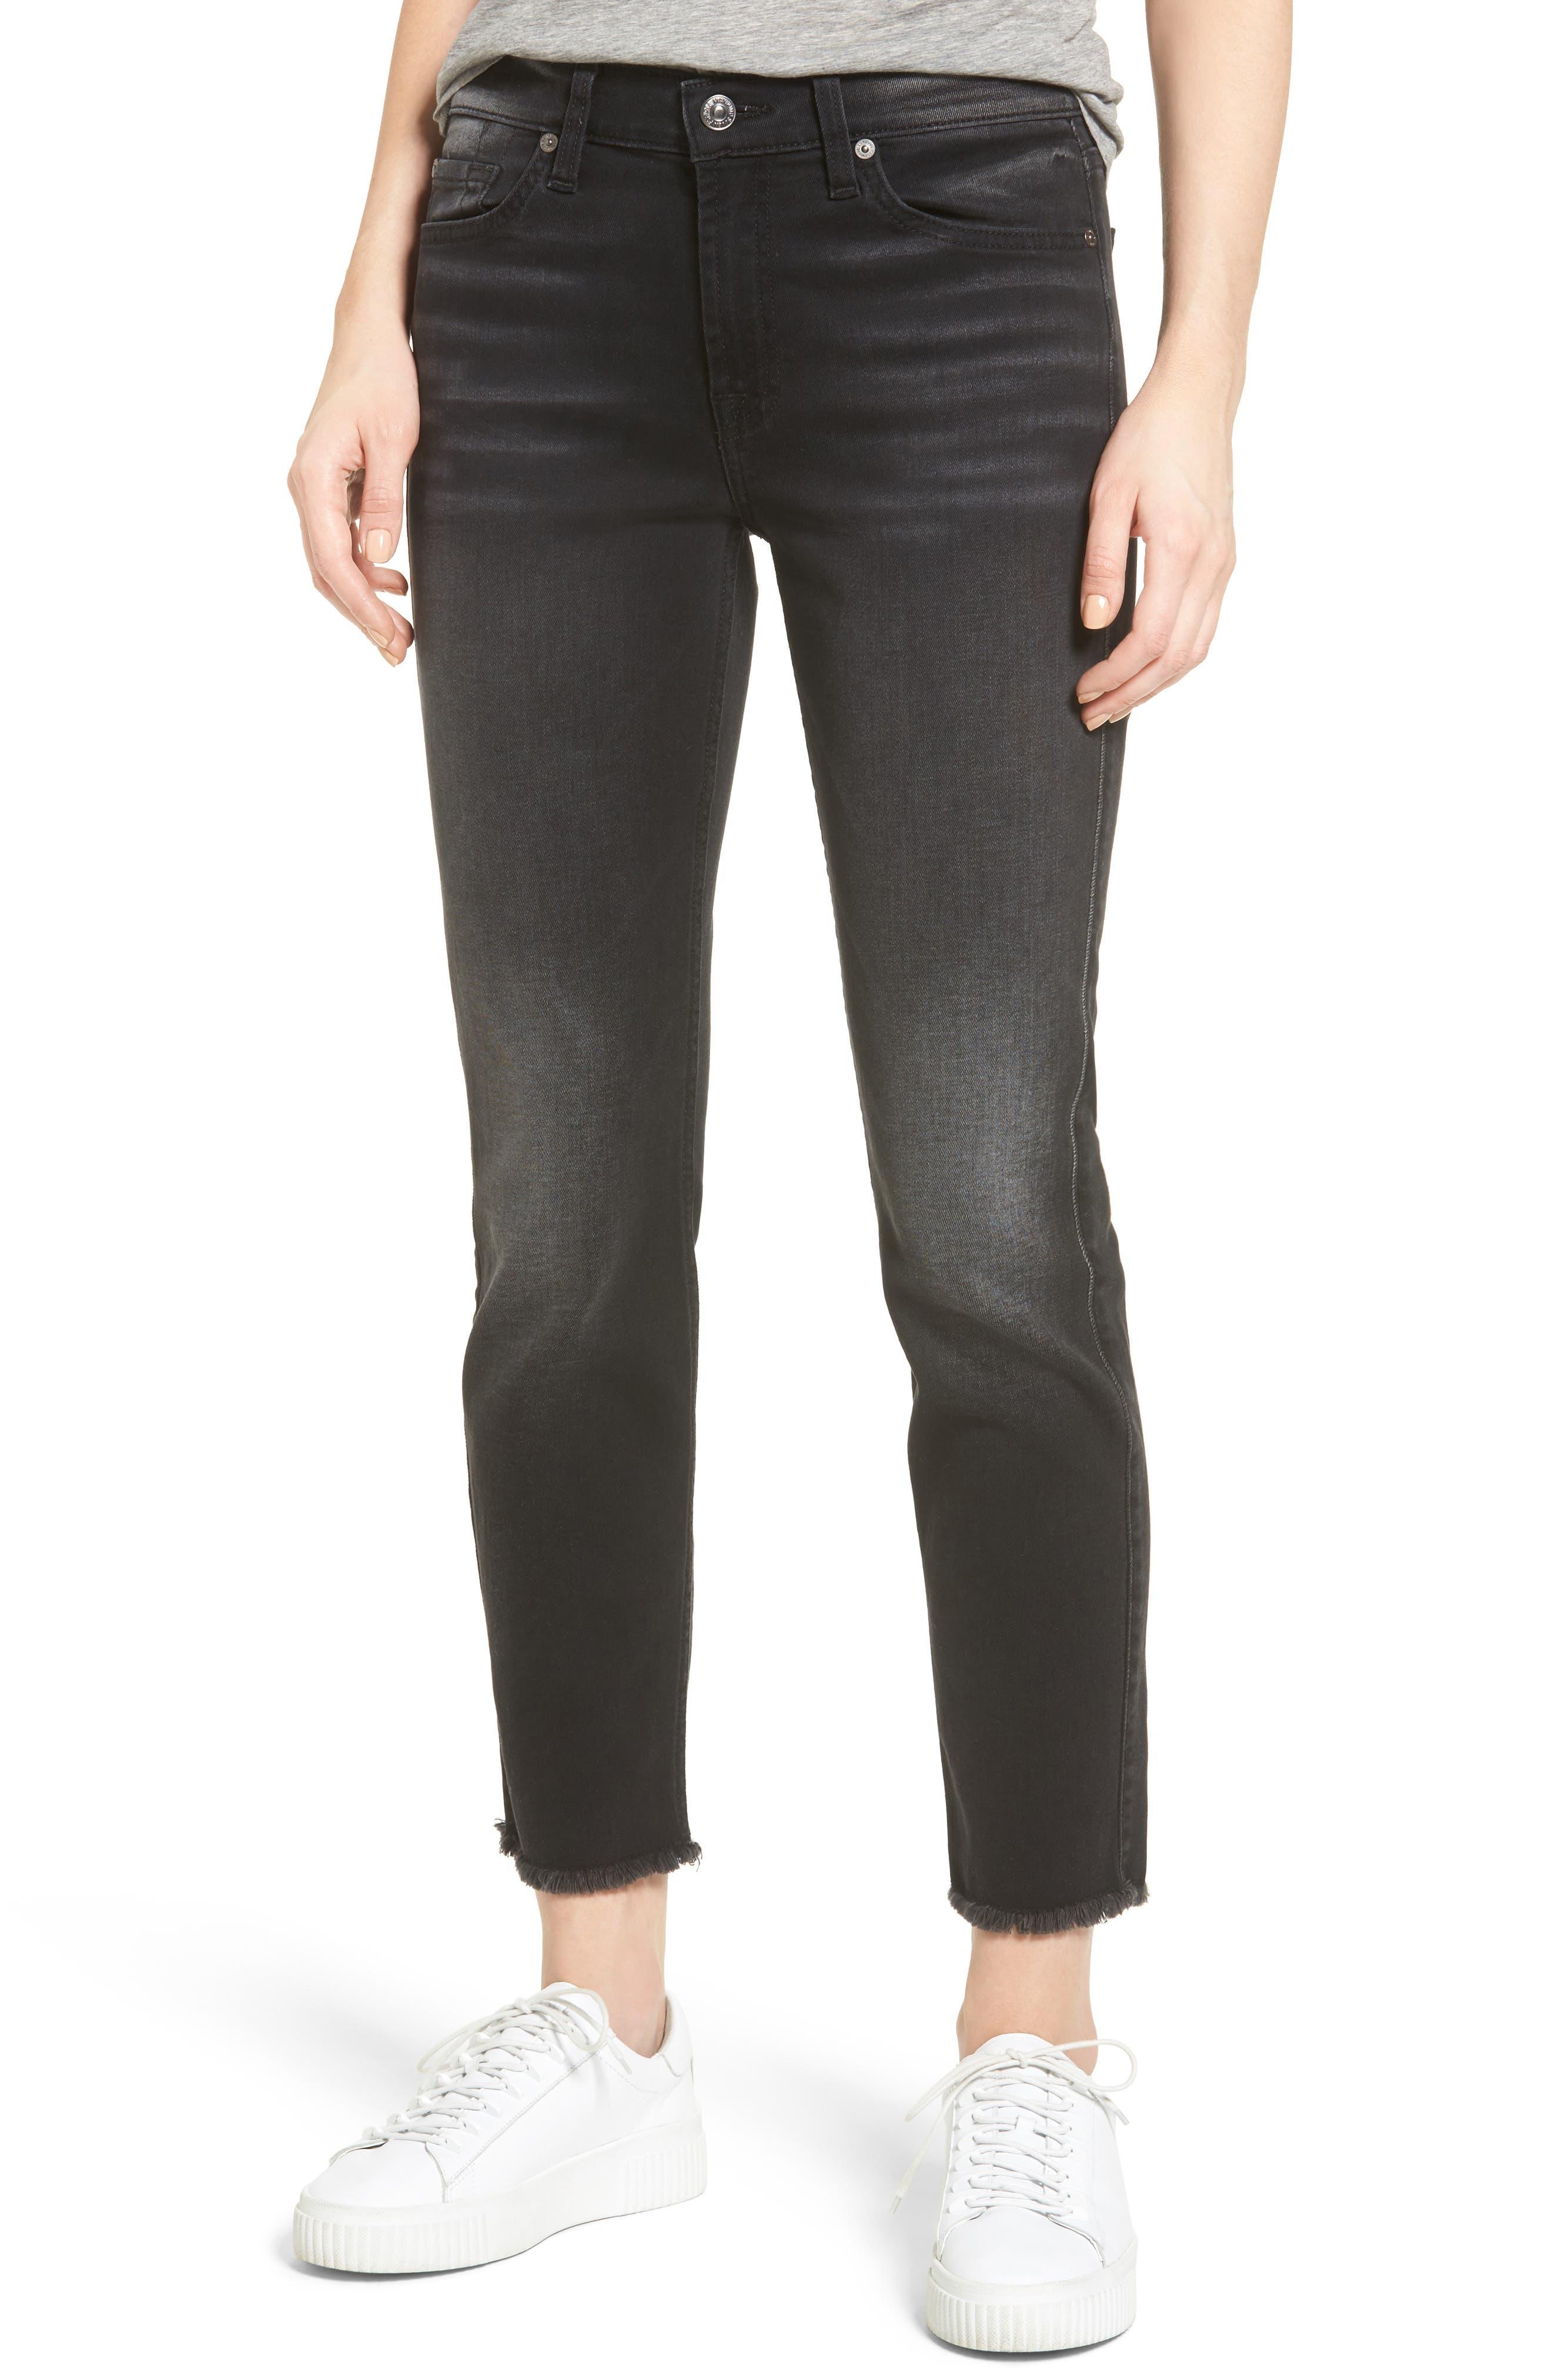 Seven7 Roxanne Raw Hem Ankle Jeans,                             Main thumbnail 1, color,                             004